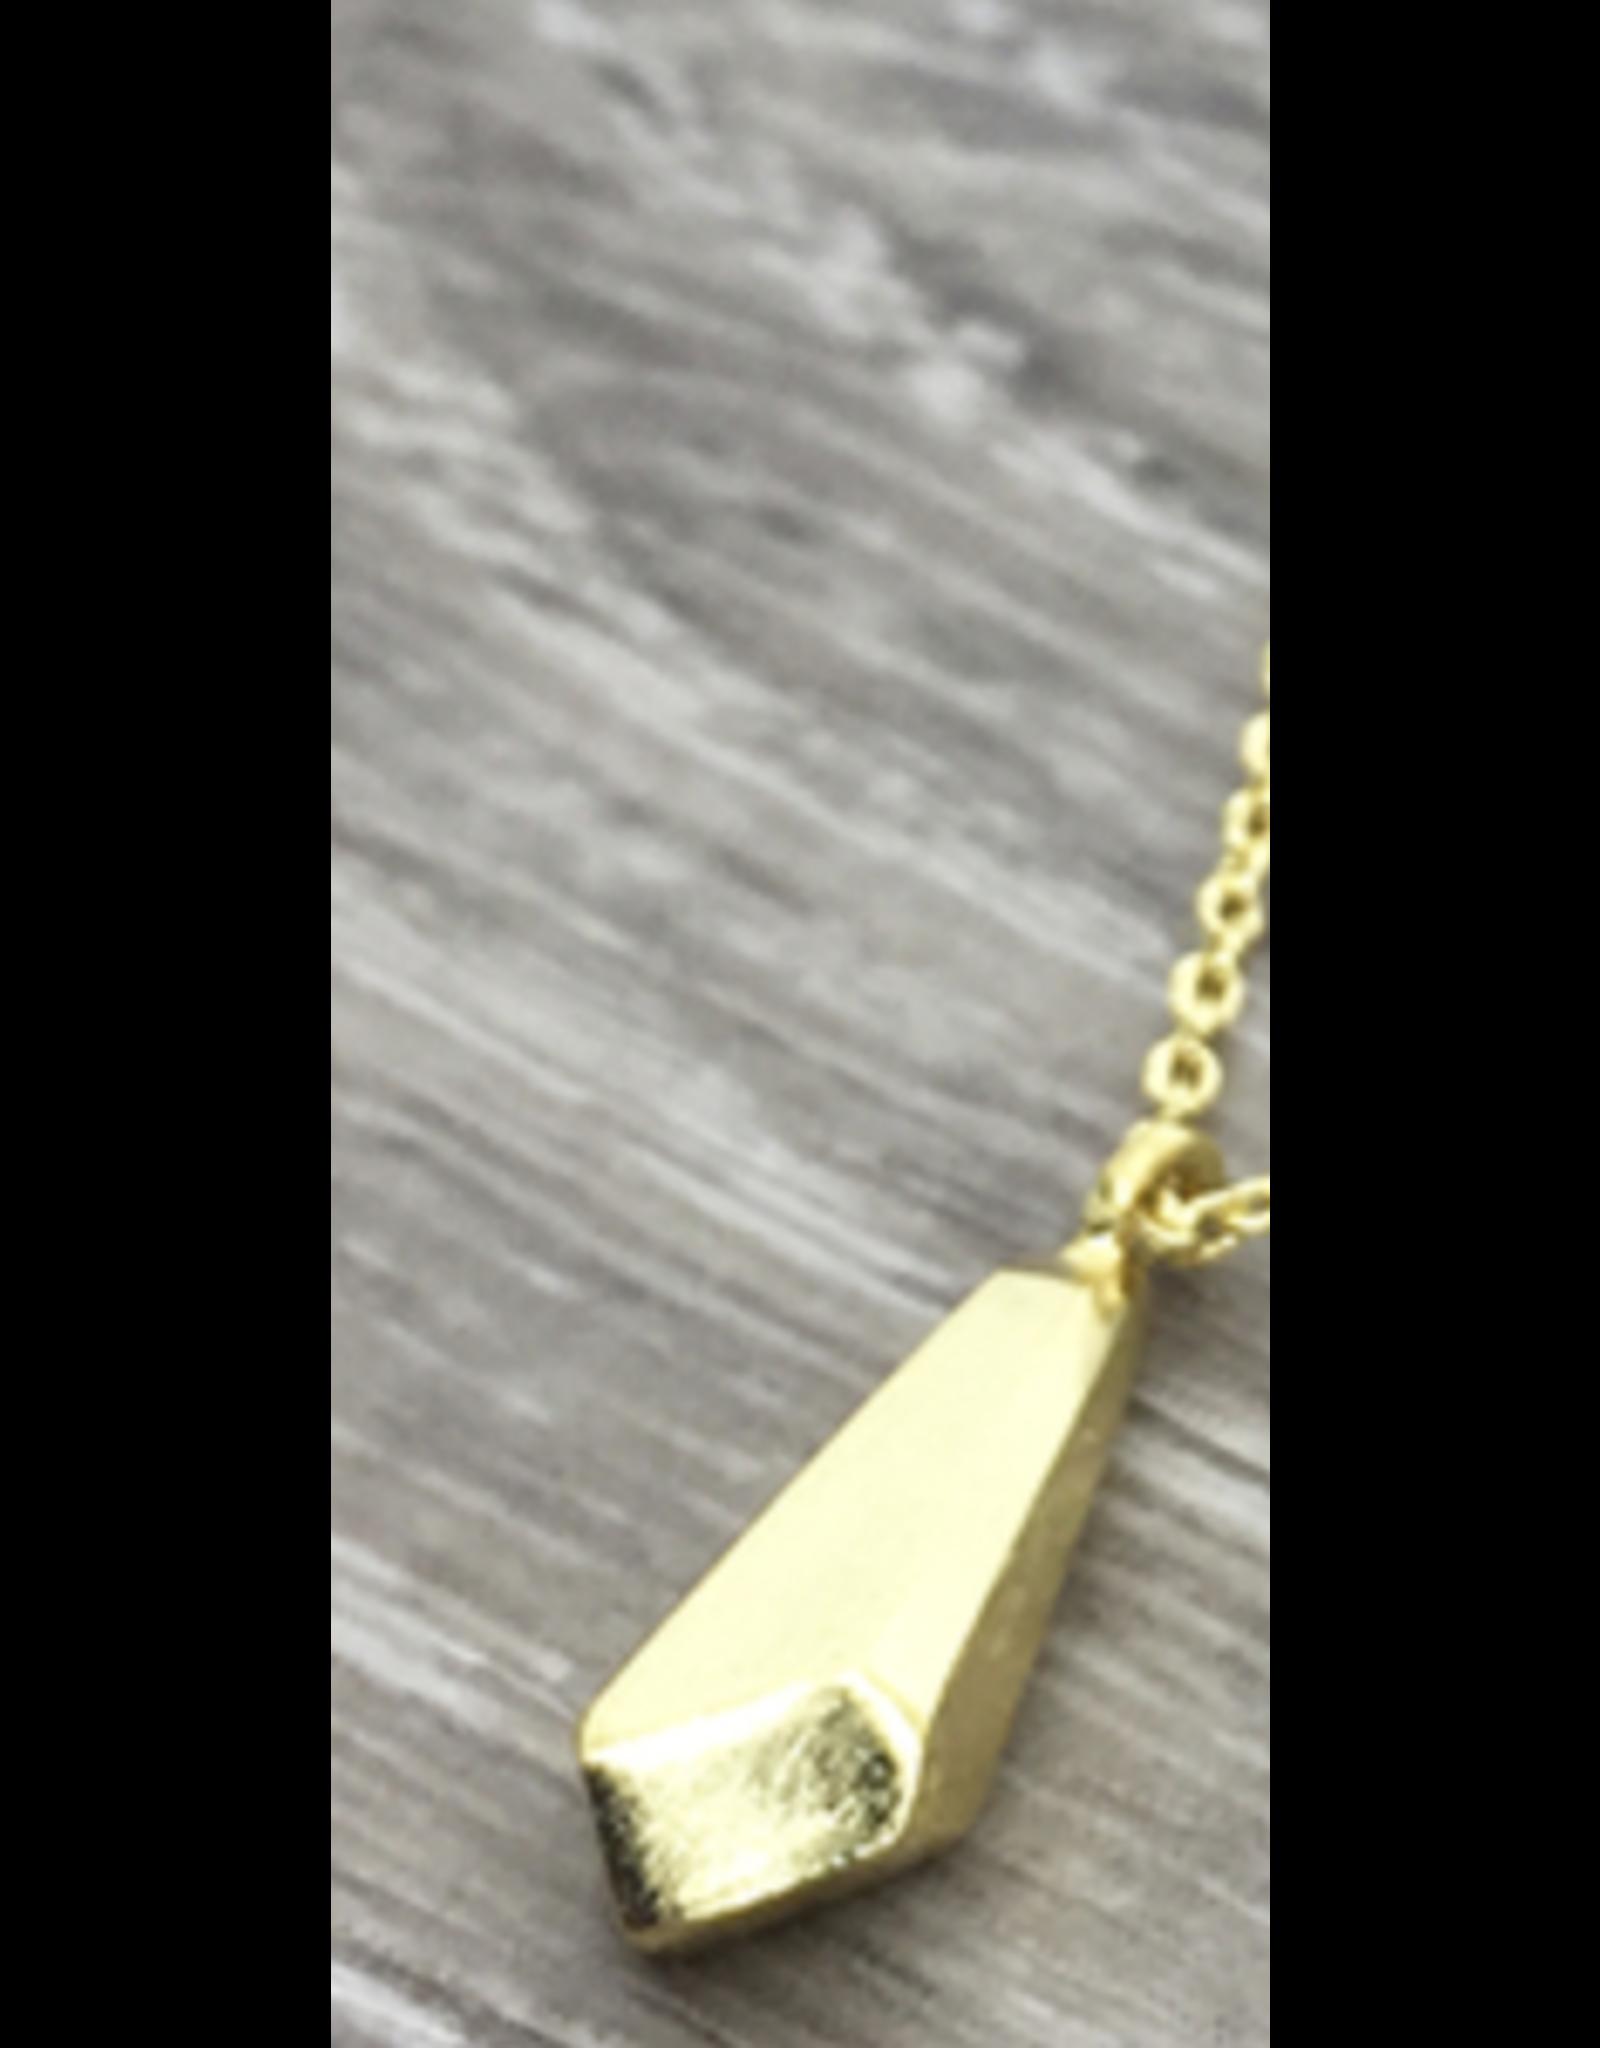 jj + rr Faceted Bead Pendant Necklace Gold